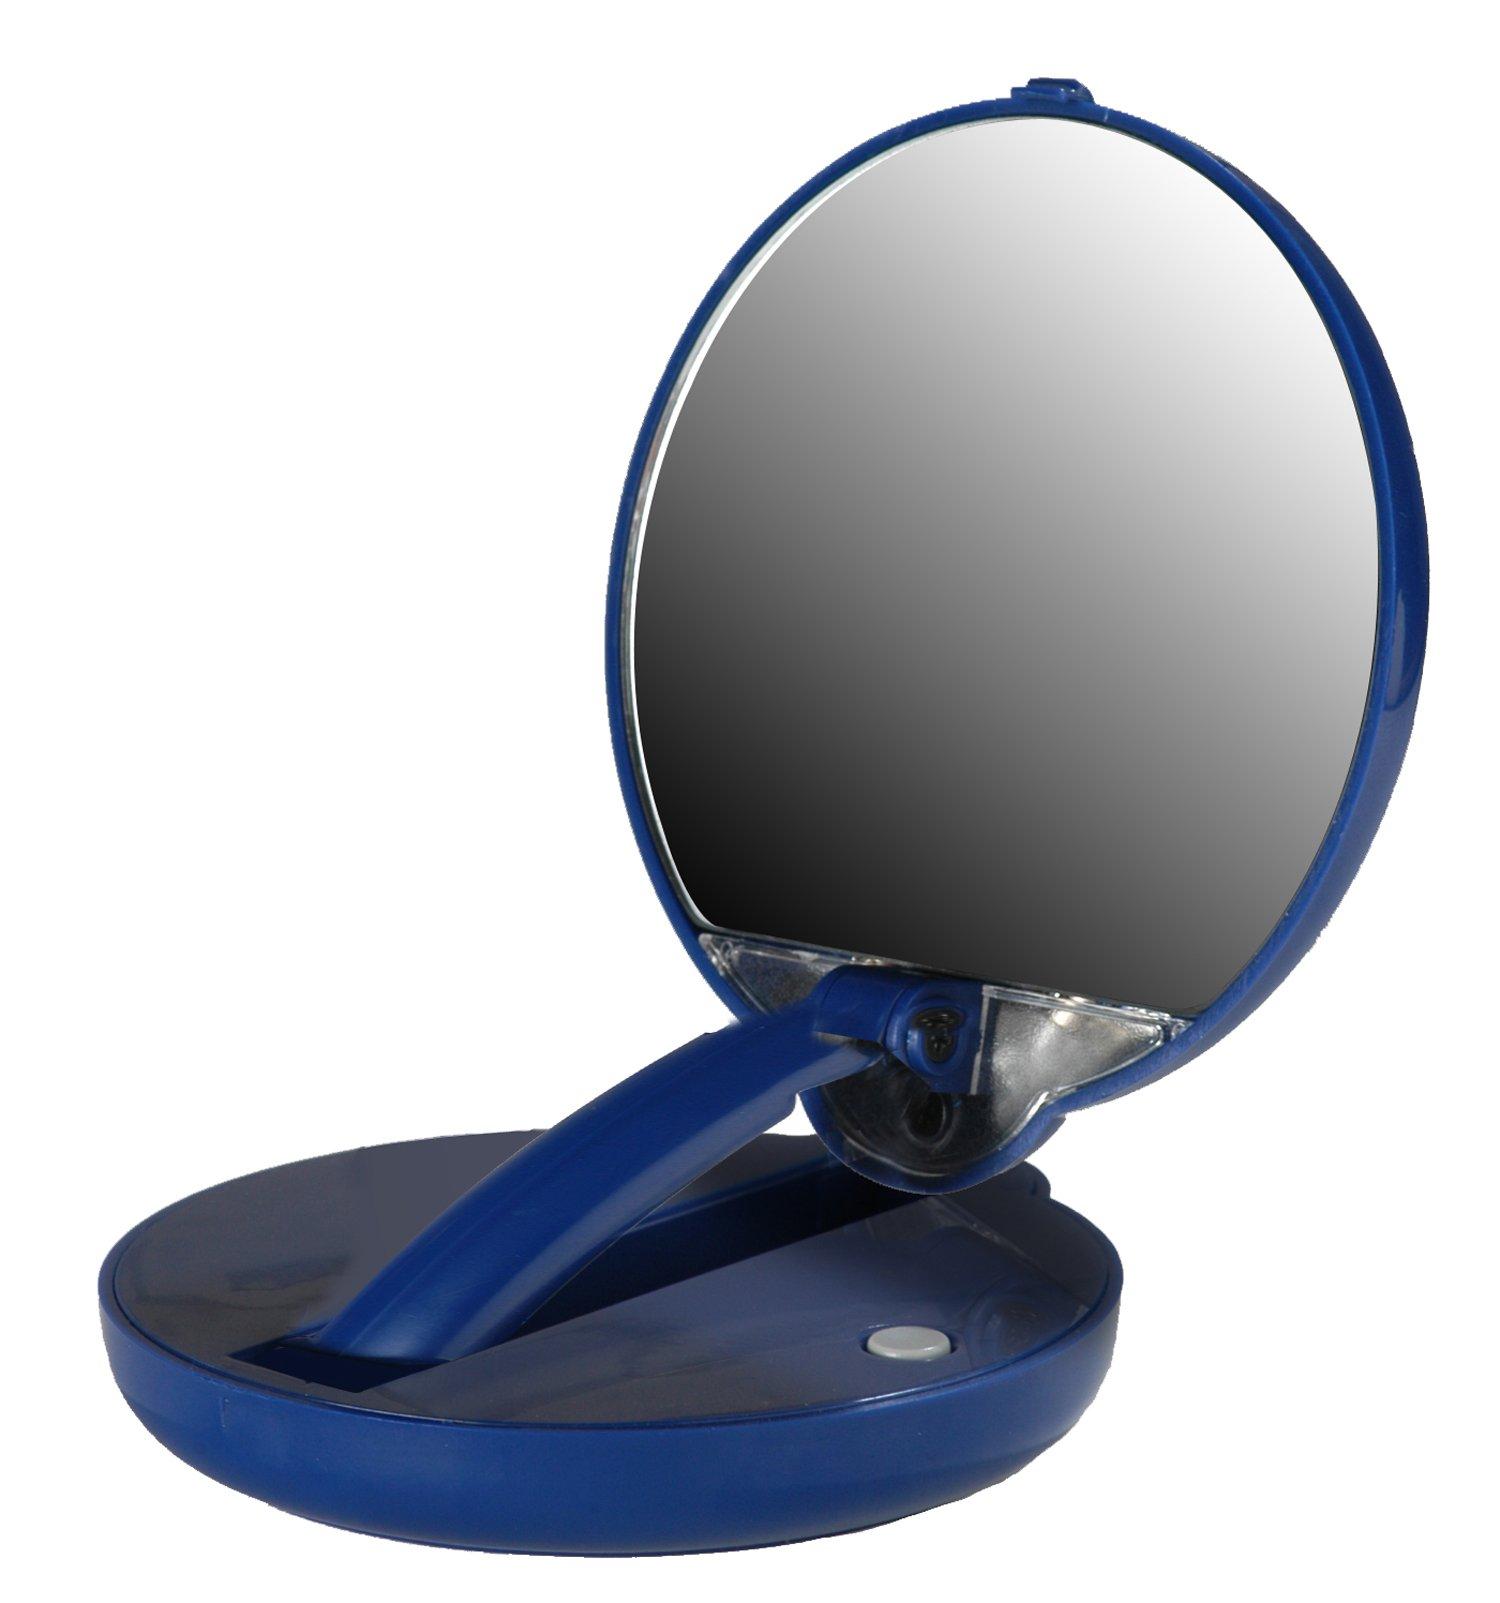 Floxite FL-15ACP FL15ACP Mirrormateadjustcompact 15Xmag by Floxite